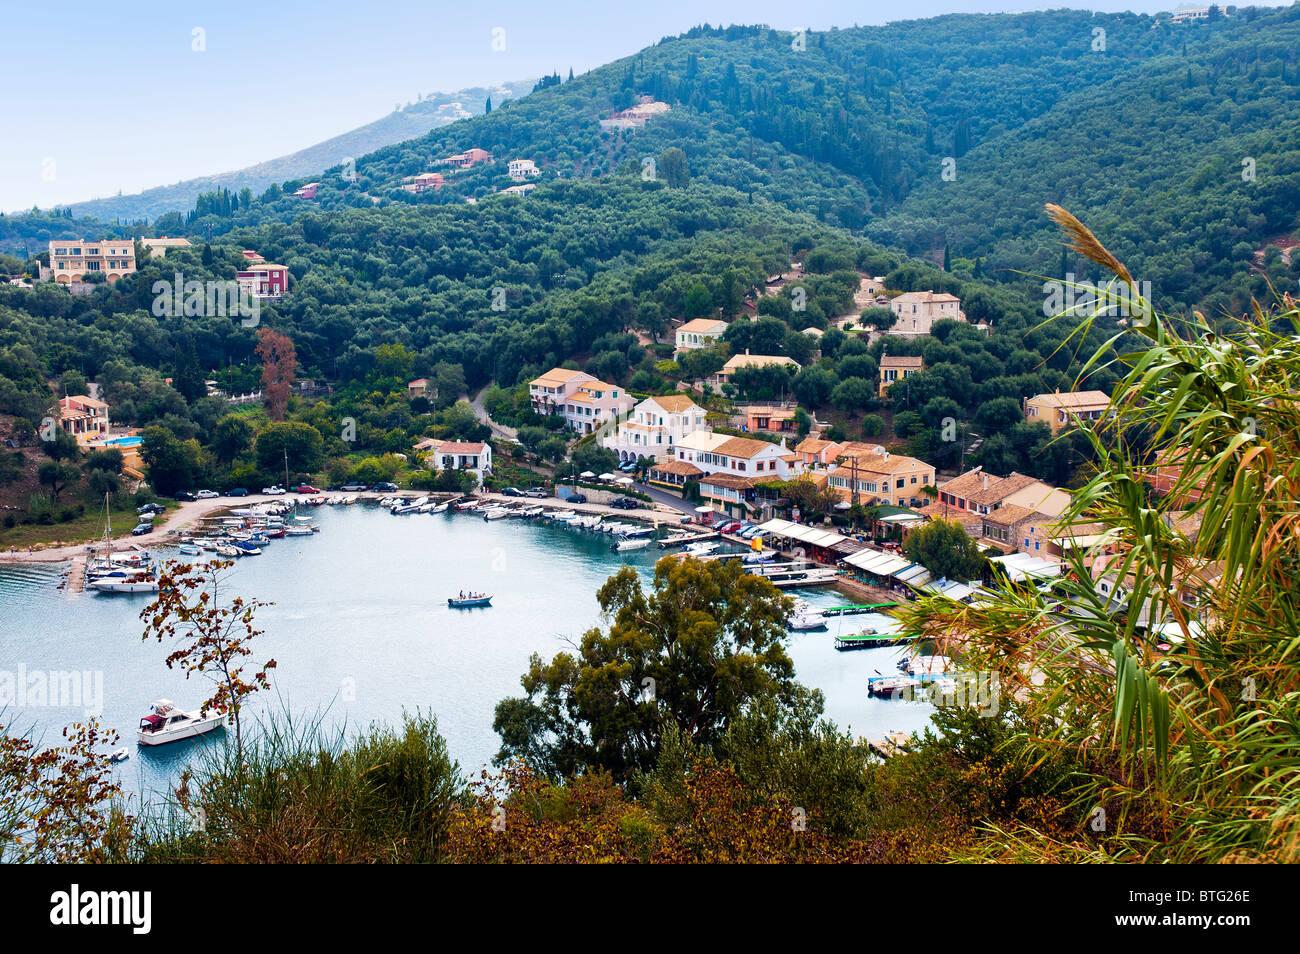 Agios Stefanos, Corfu, Ionian Islands Greece. - Stock Image